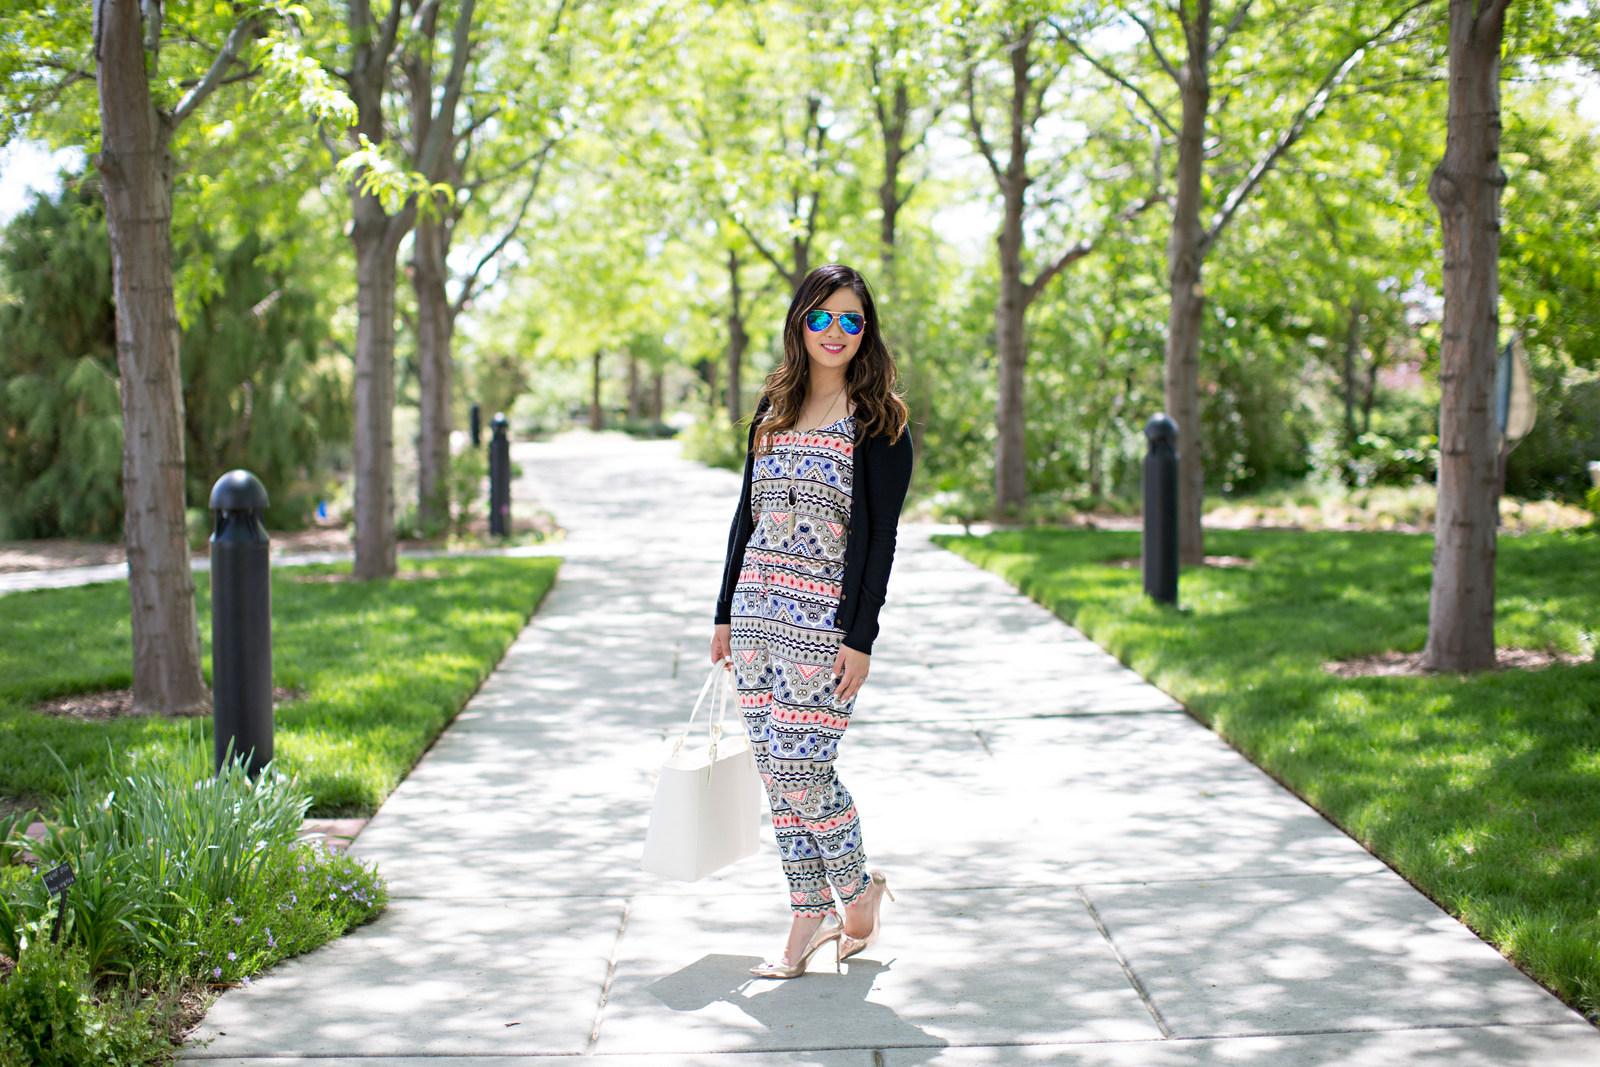 Sandy a la Mode | Fashion Blogger Wearing Jumpsuit